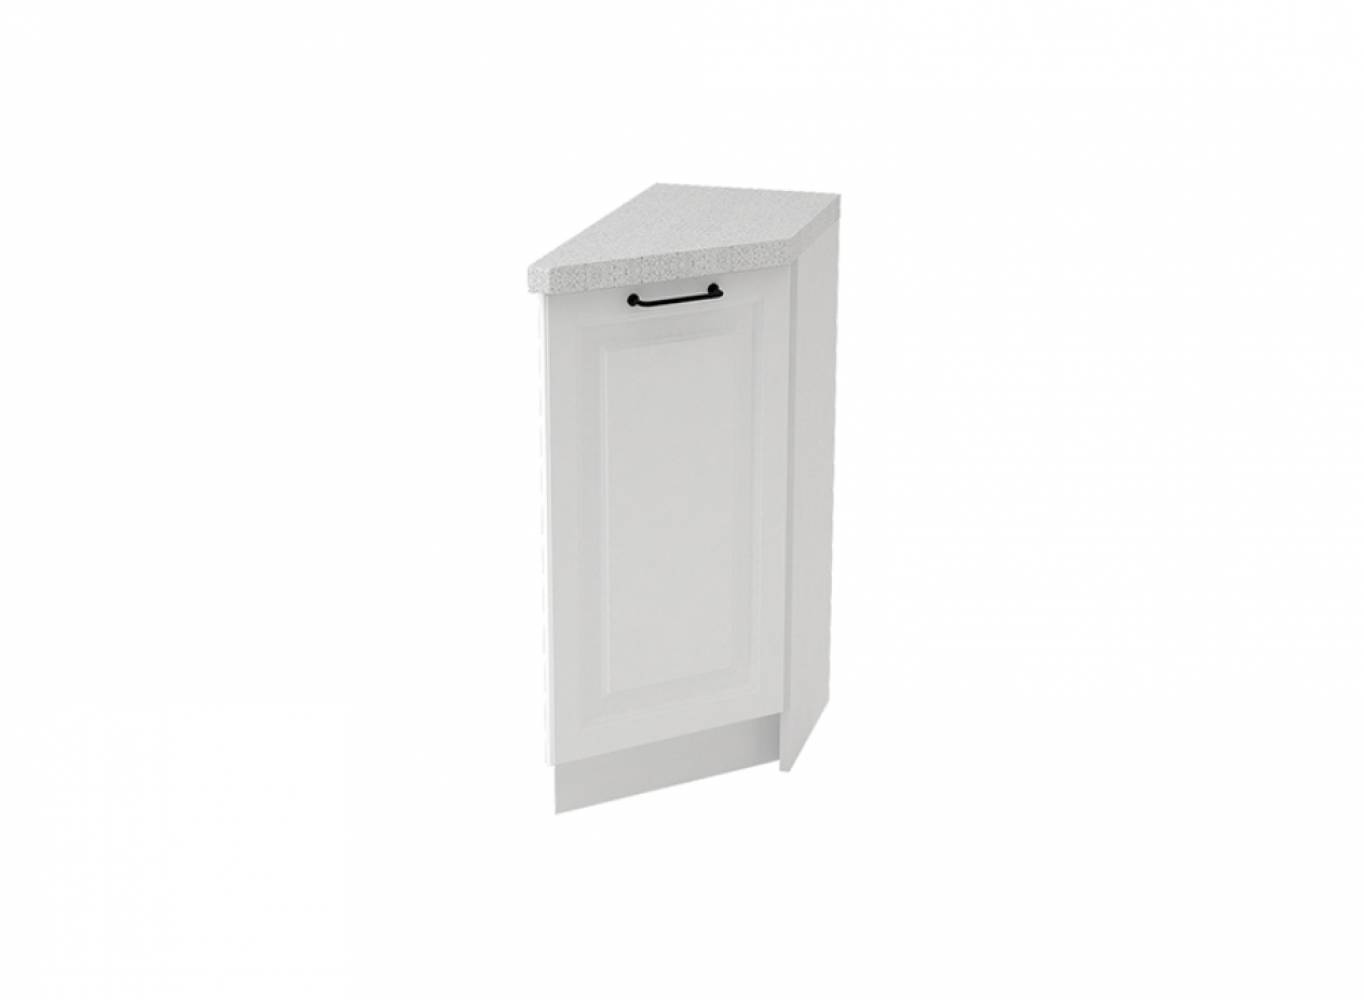 Шкаф нижний угловой торцевой правый ШНТ 300 R НИЦЦА ROYAL (BLANCO) 300 мм